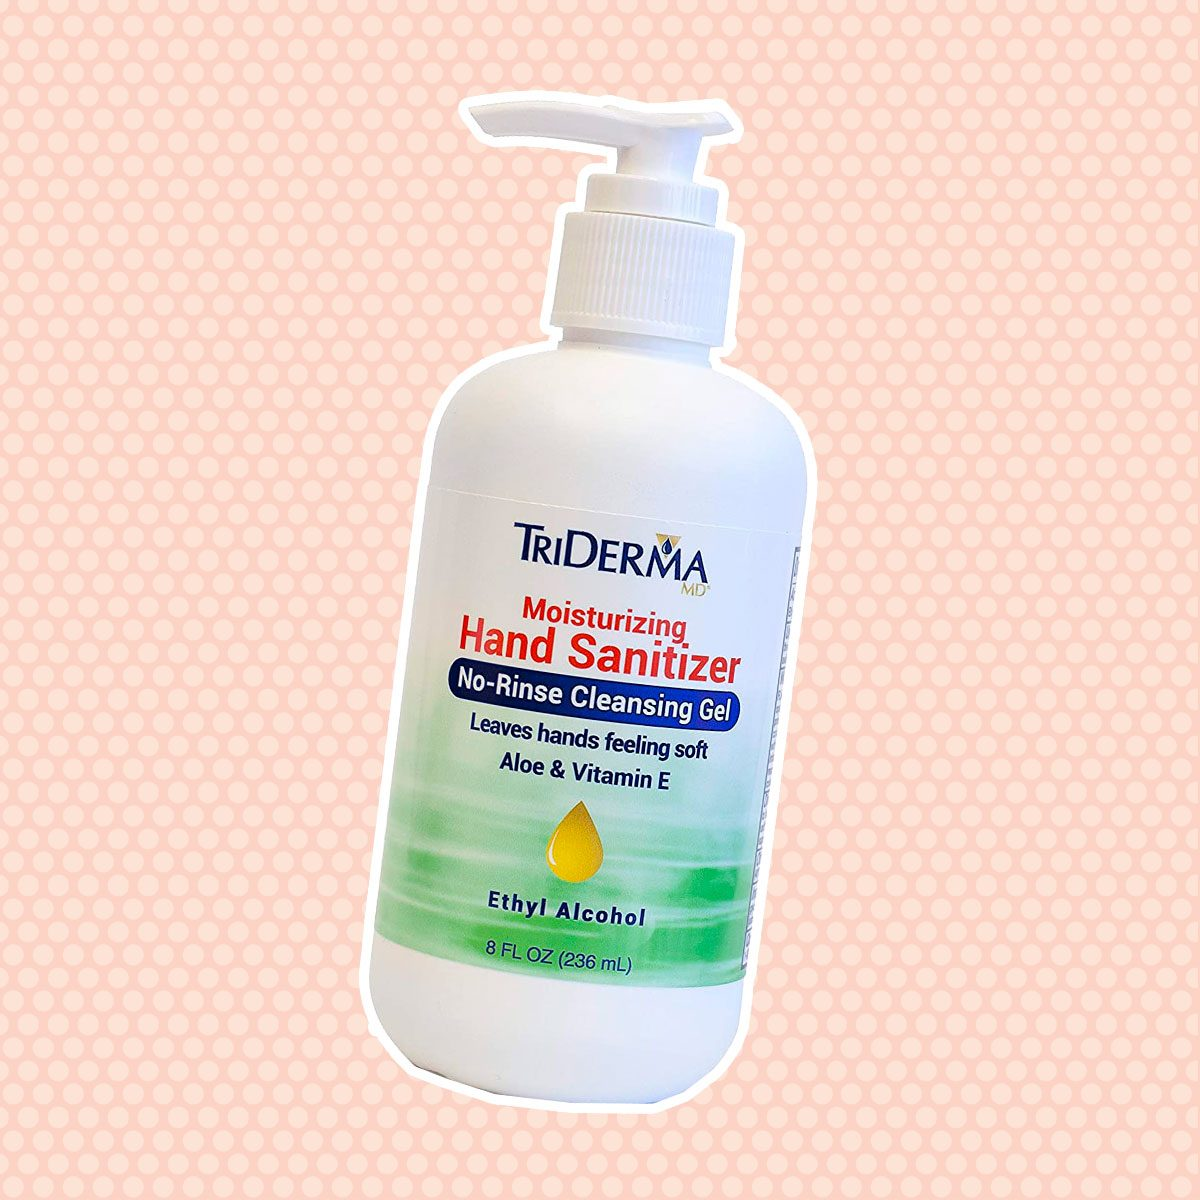 Moisturizing Hand Sanitizer 62% Ethyl Alcohol (8oz)